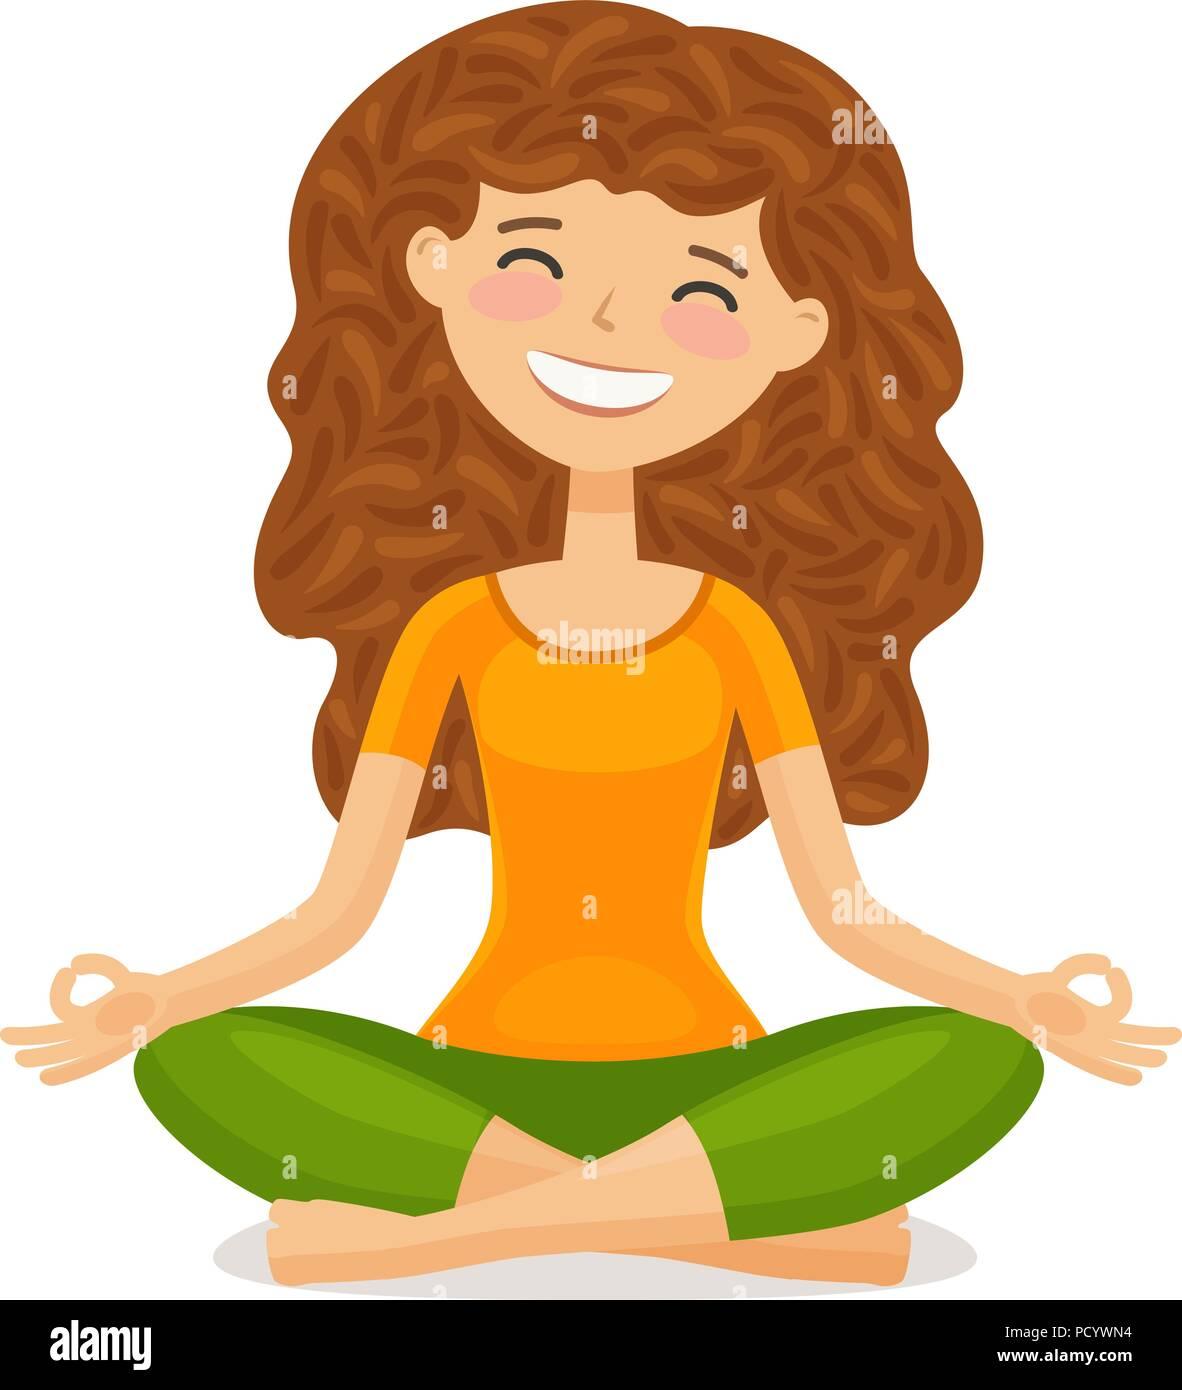 Cute Girl Doing Yoga Relaxation Meditation Concept Funny Cartoon Vector Illustration Stock Vector Image Art Alamy